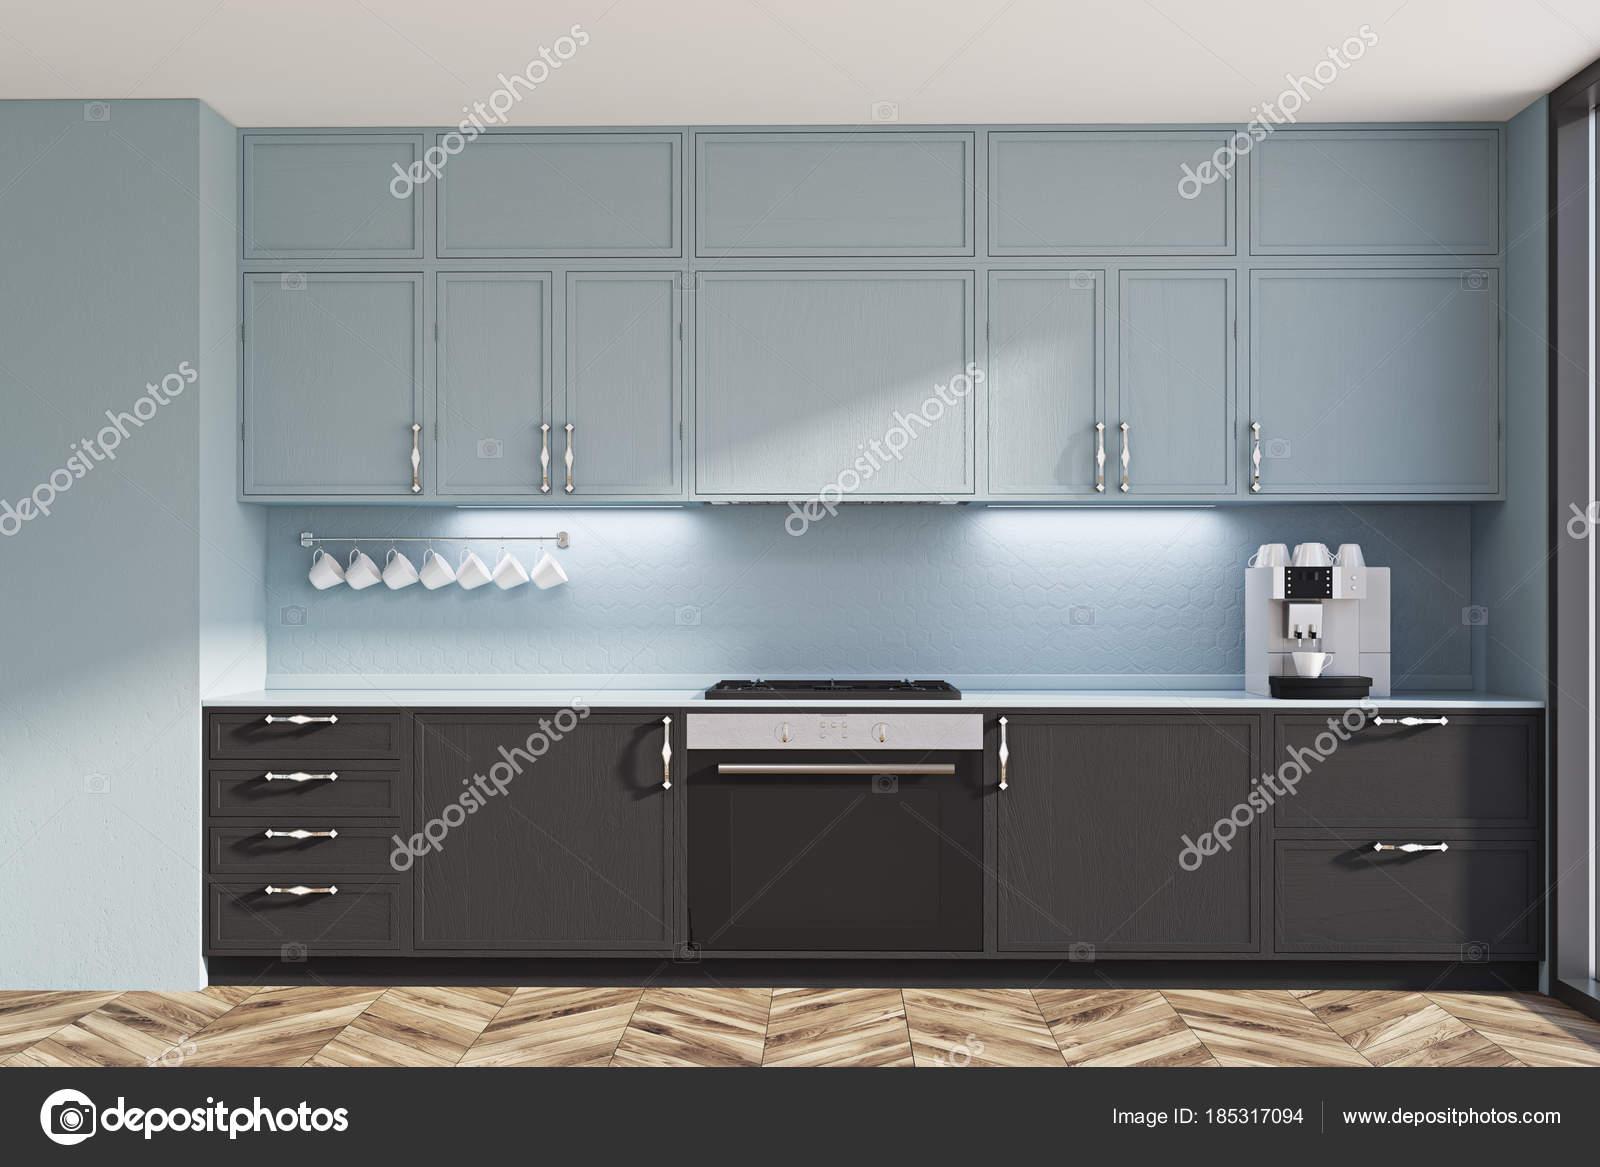 Zwarte Keuken Ideeen : Grijze en zwarte originele keuken idee u2014 stockfoto © denisismagilov